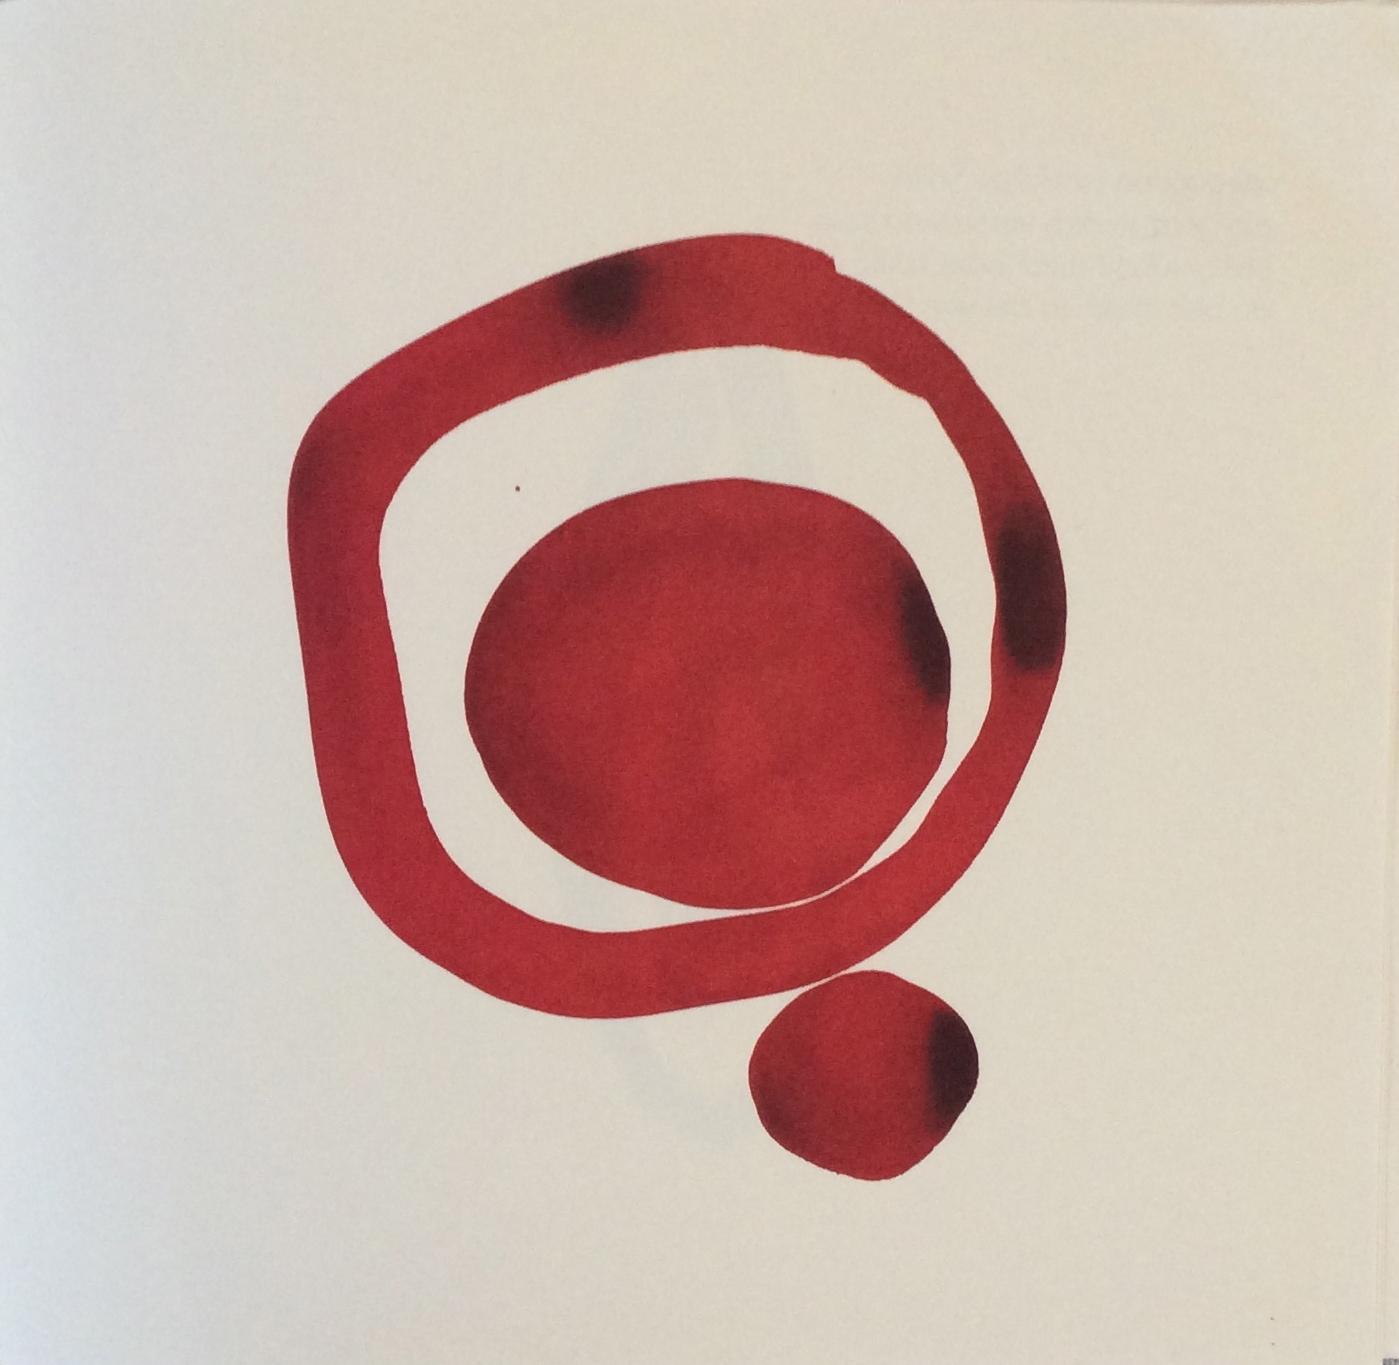 Chanelled Symbol